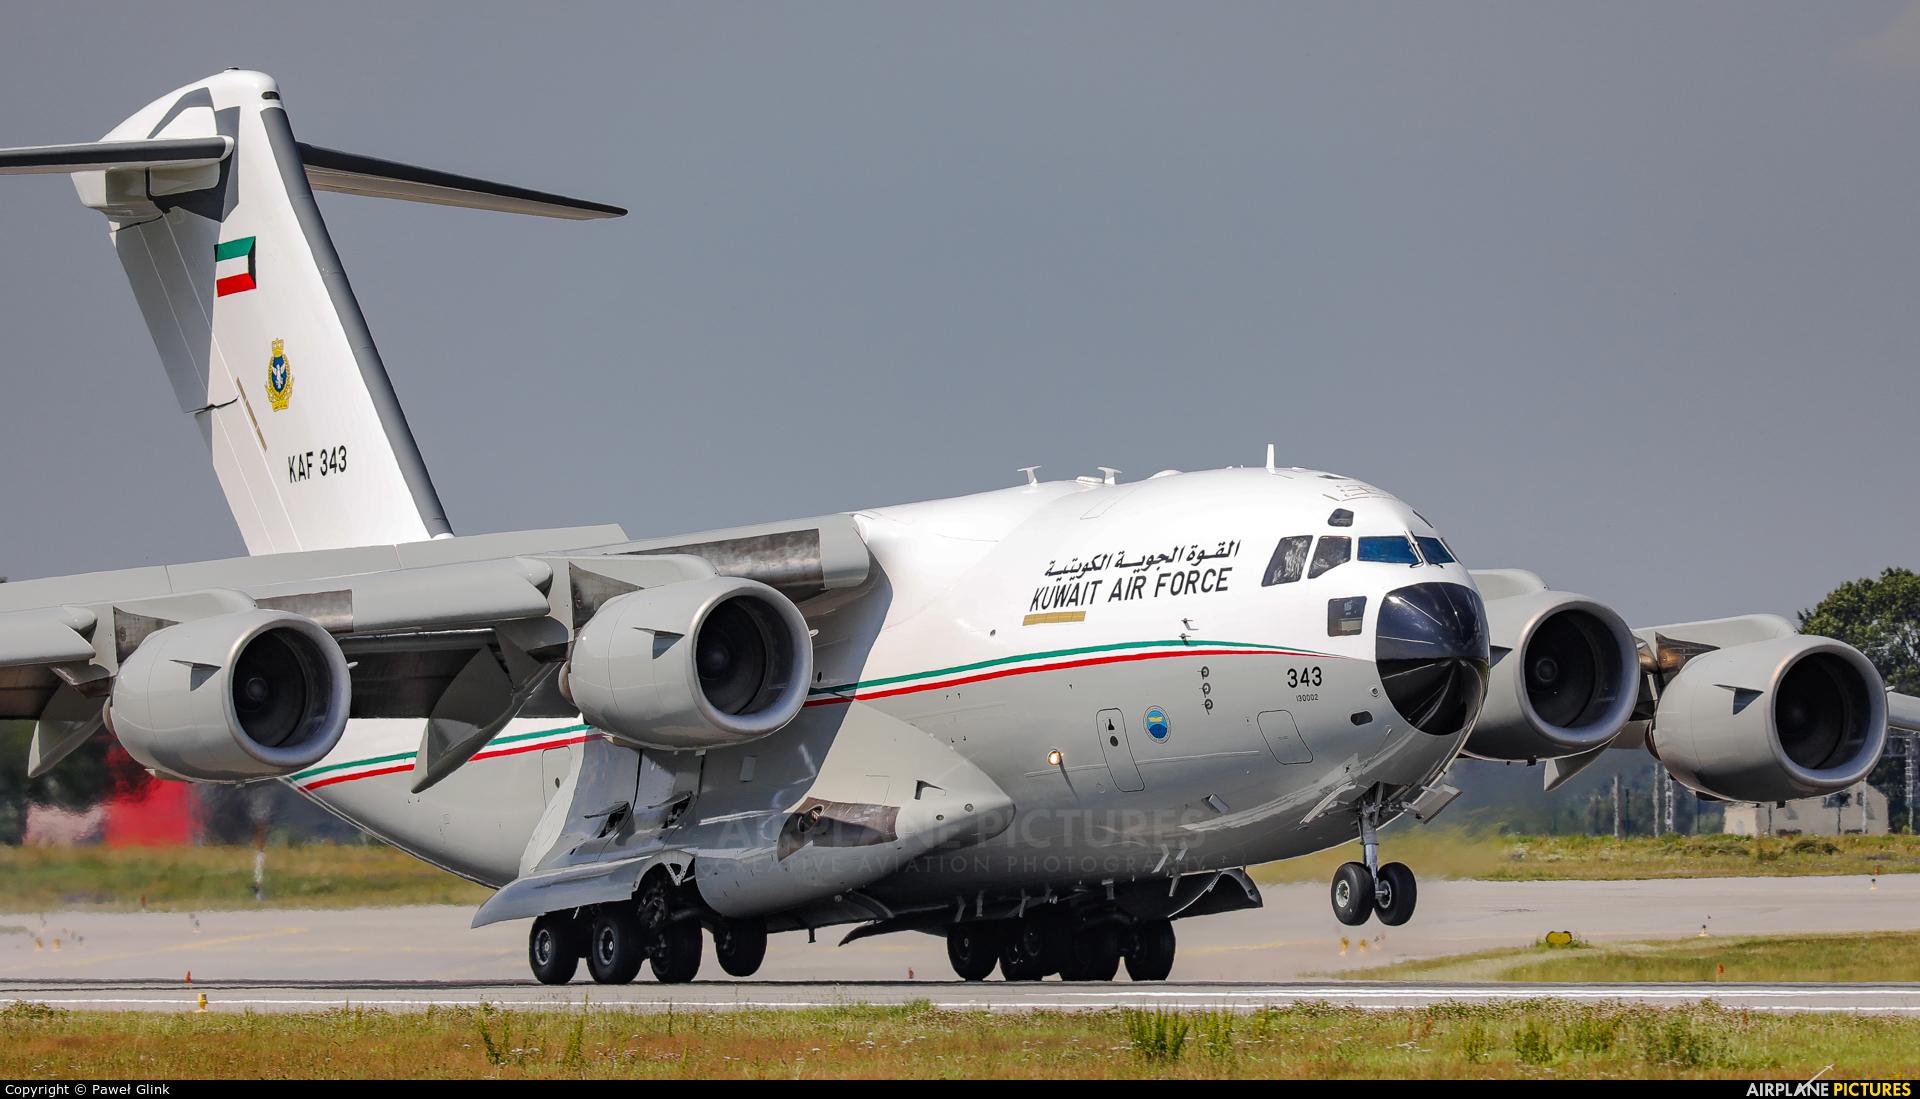 Kuwait - Air Force KAF343 aircraft at Gdańsk - Lech Wałęsa